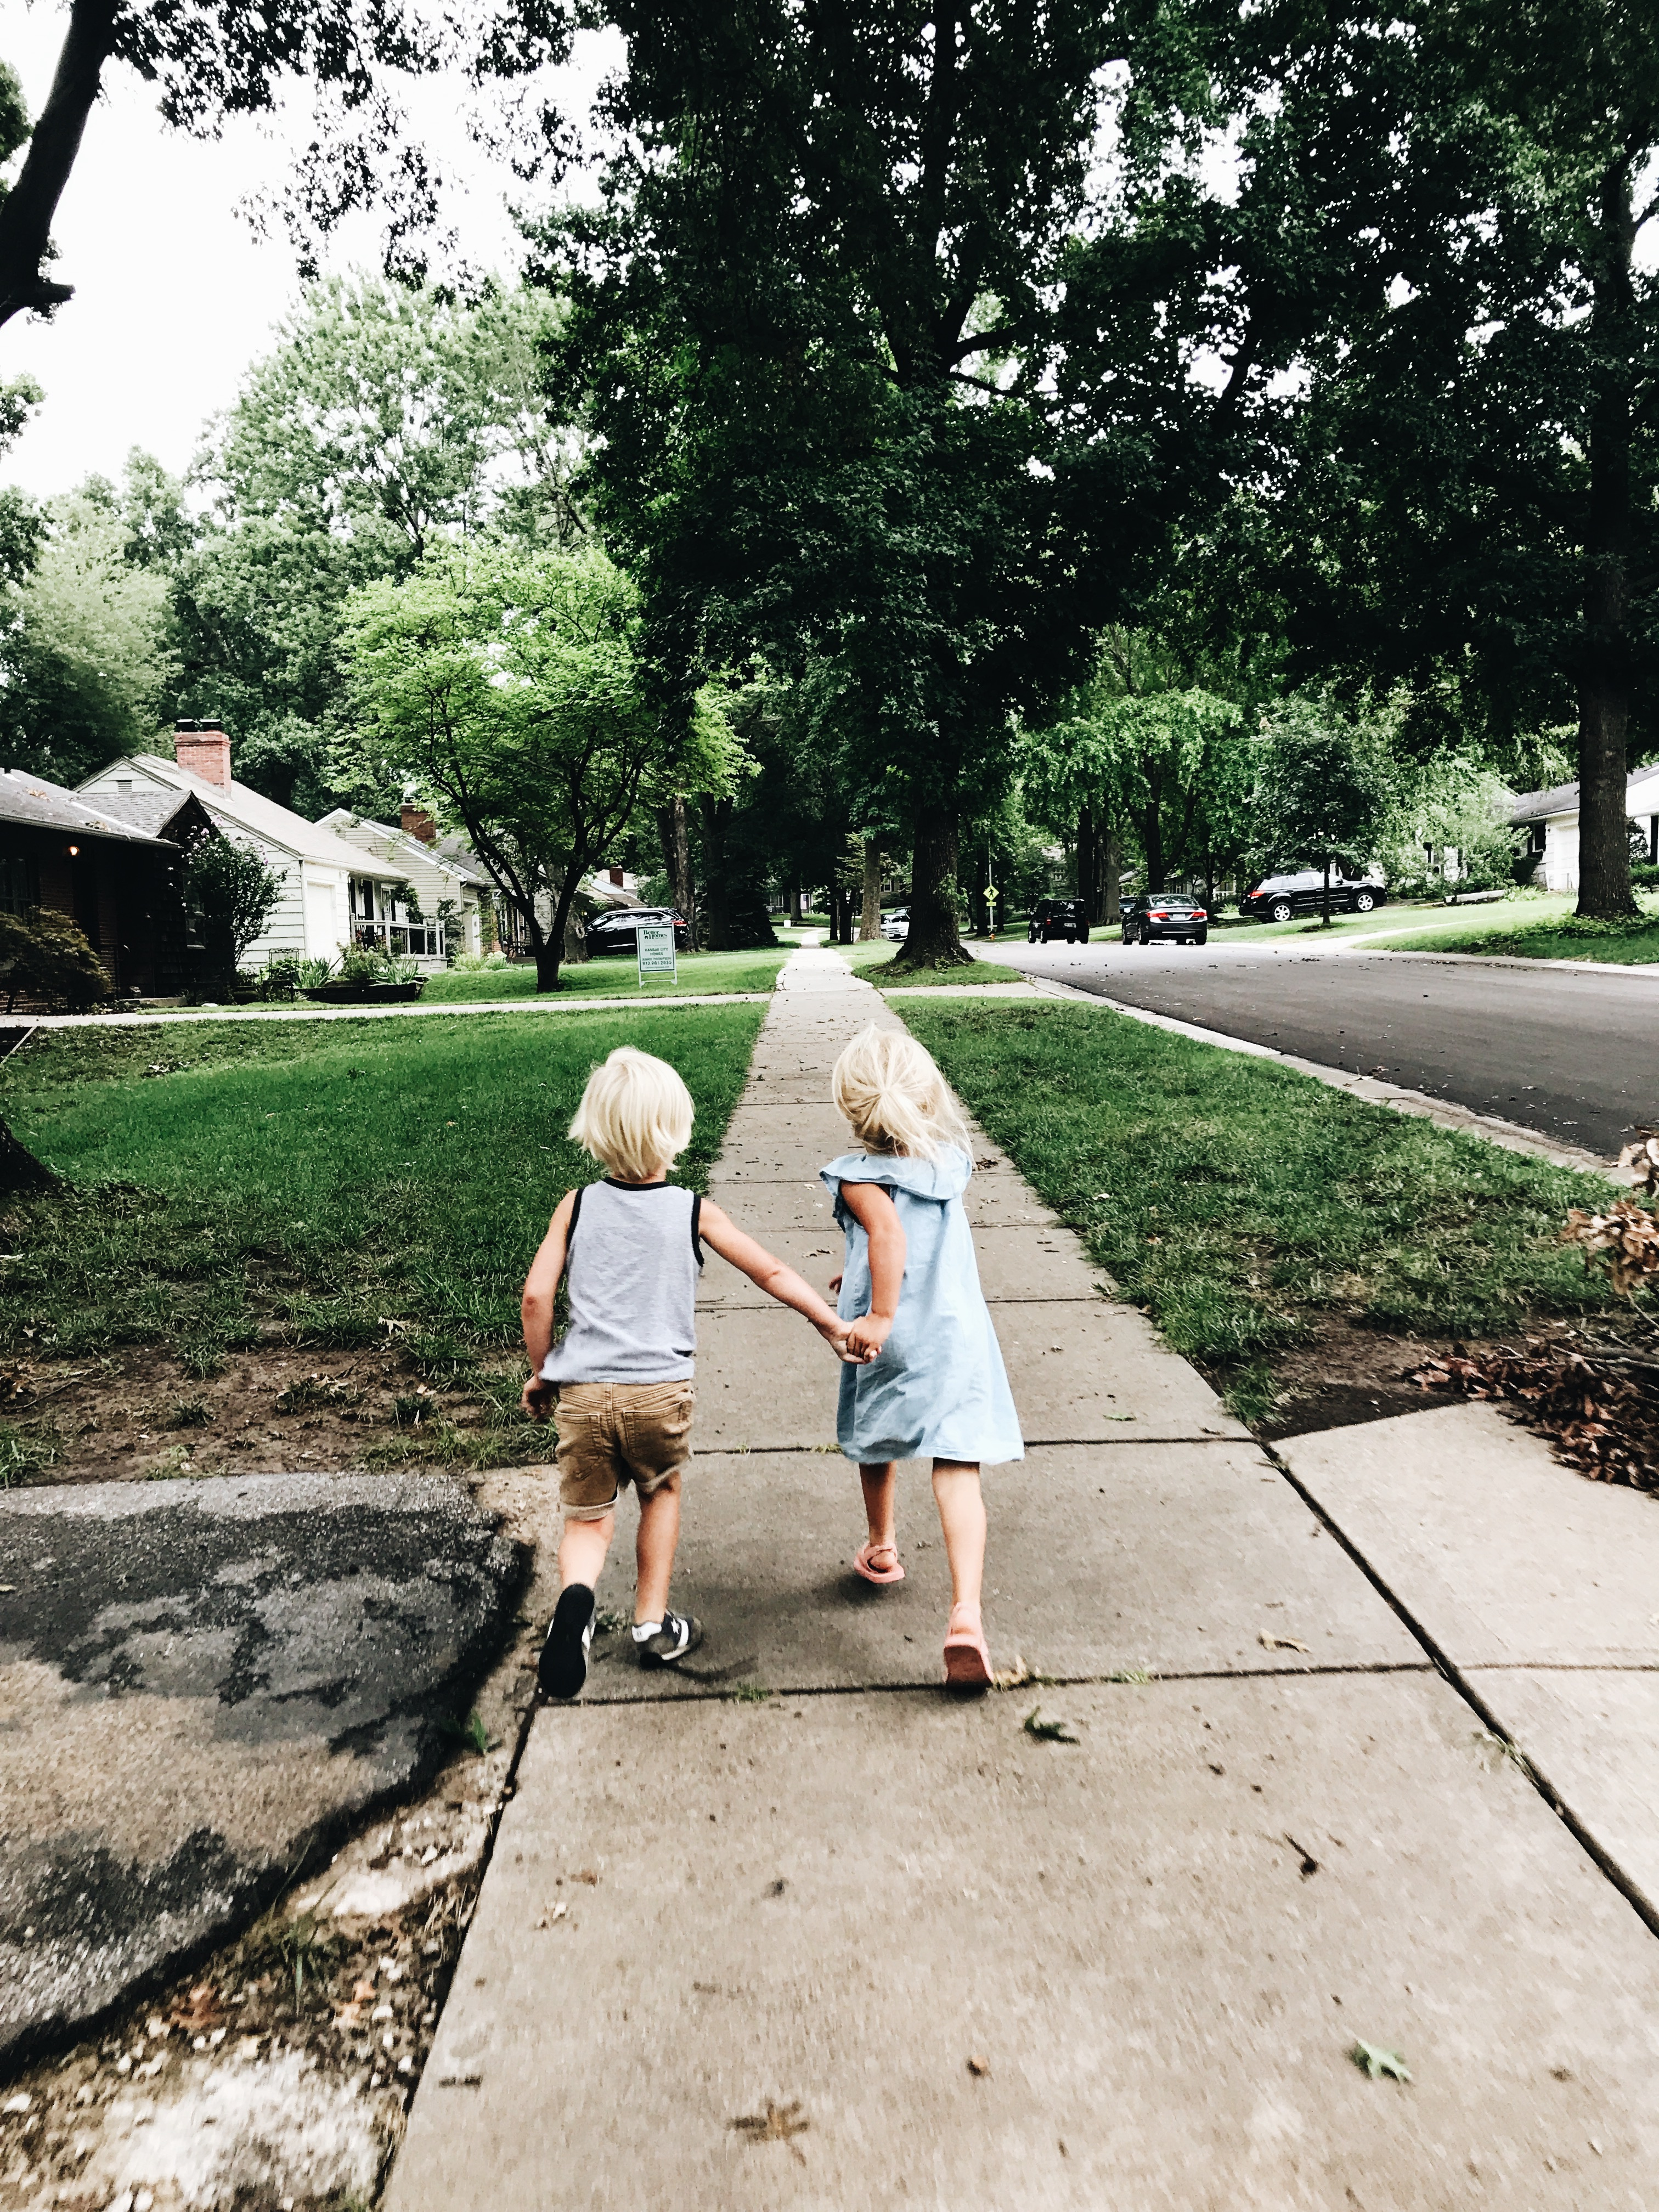 gremlins running down the street